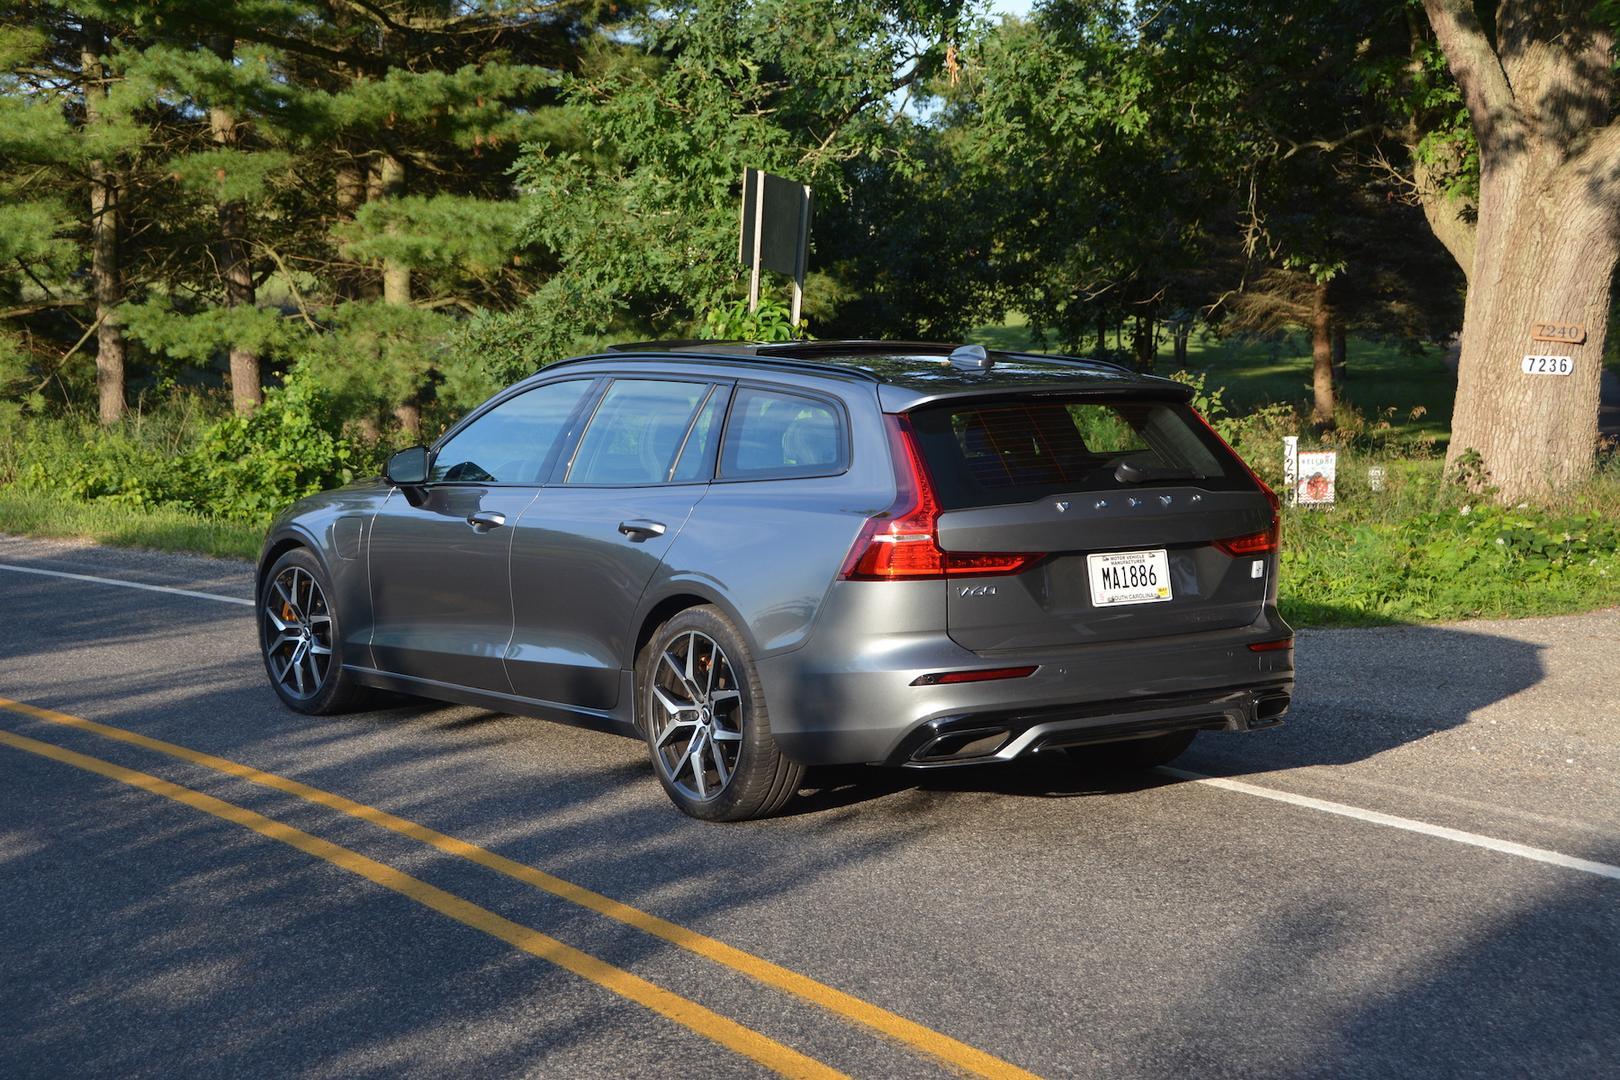 Volvo V60 T8 Polestar review